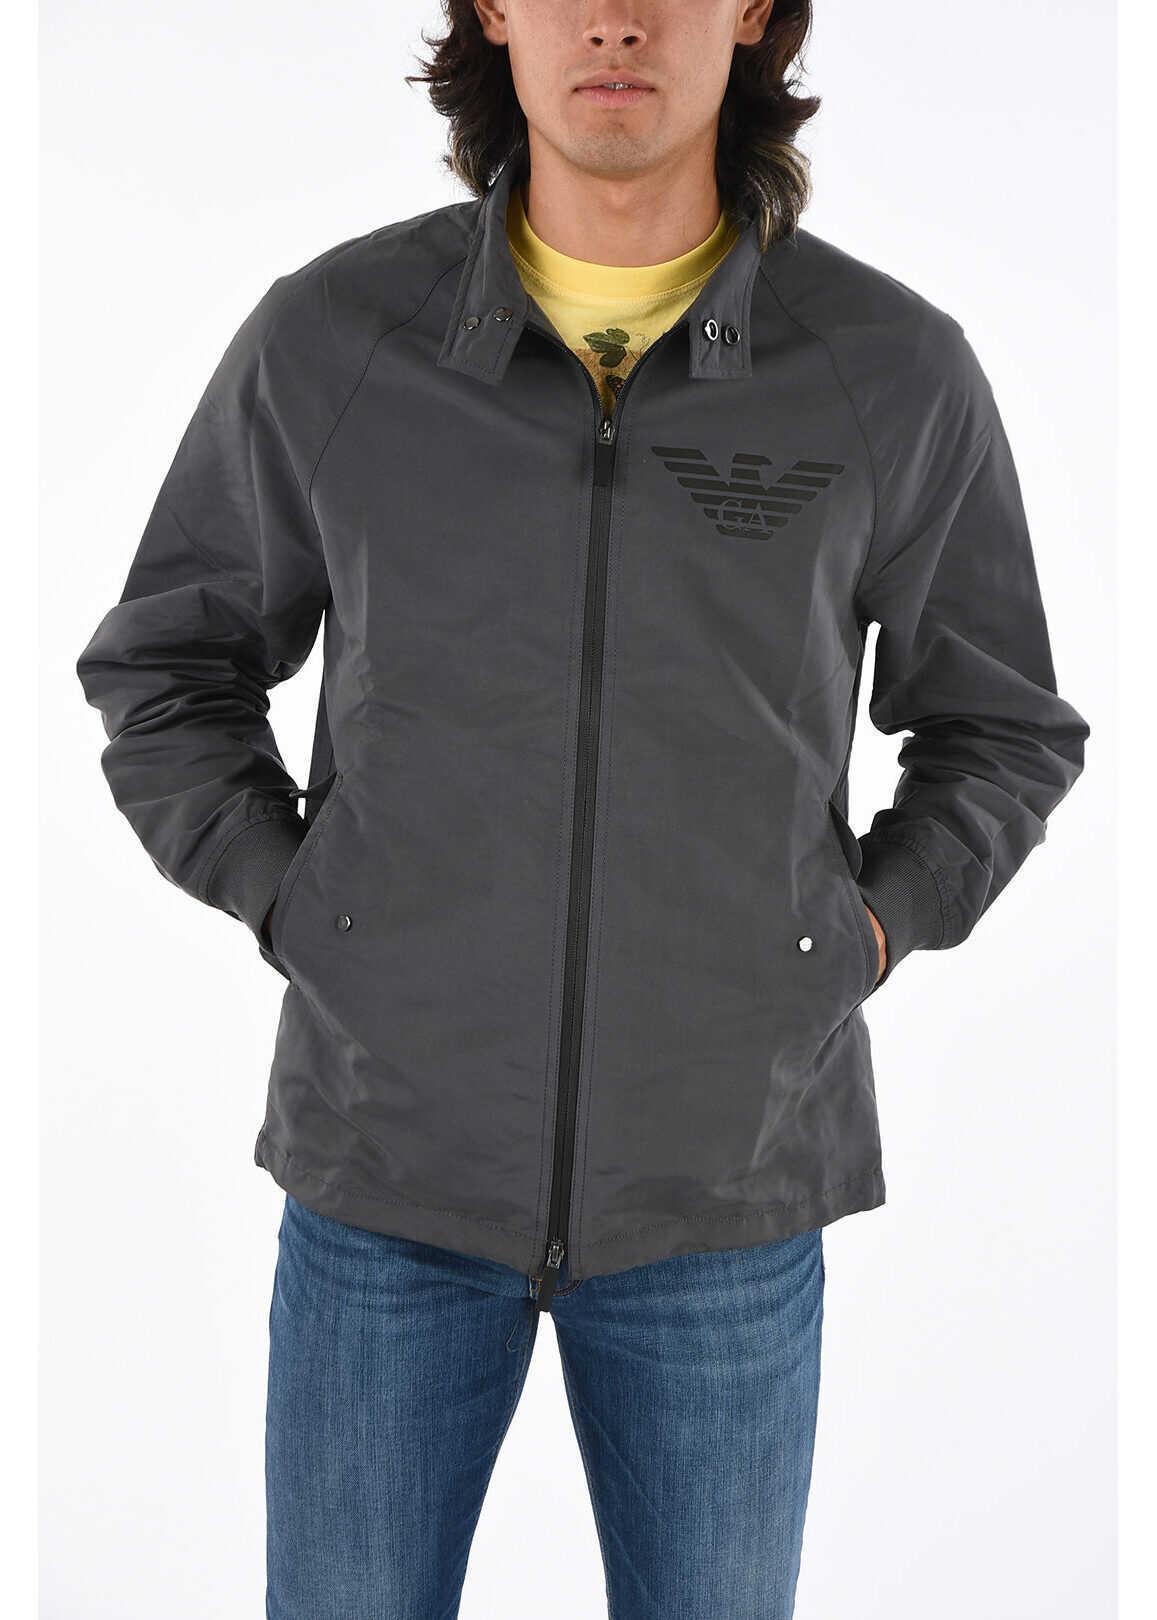 Armani EMPORIO Full Zip Jacket GRAY imagine